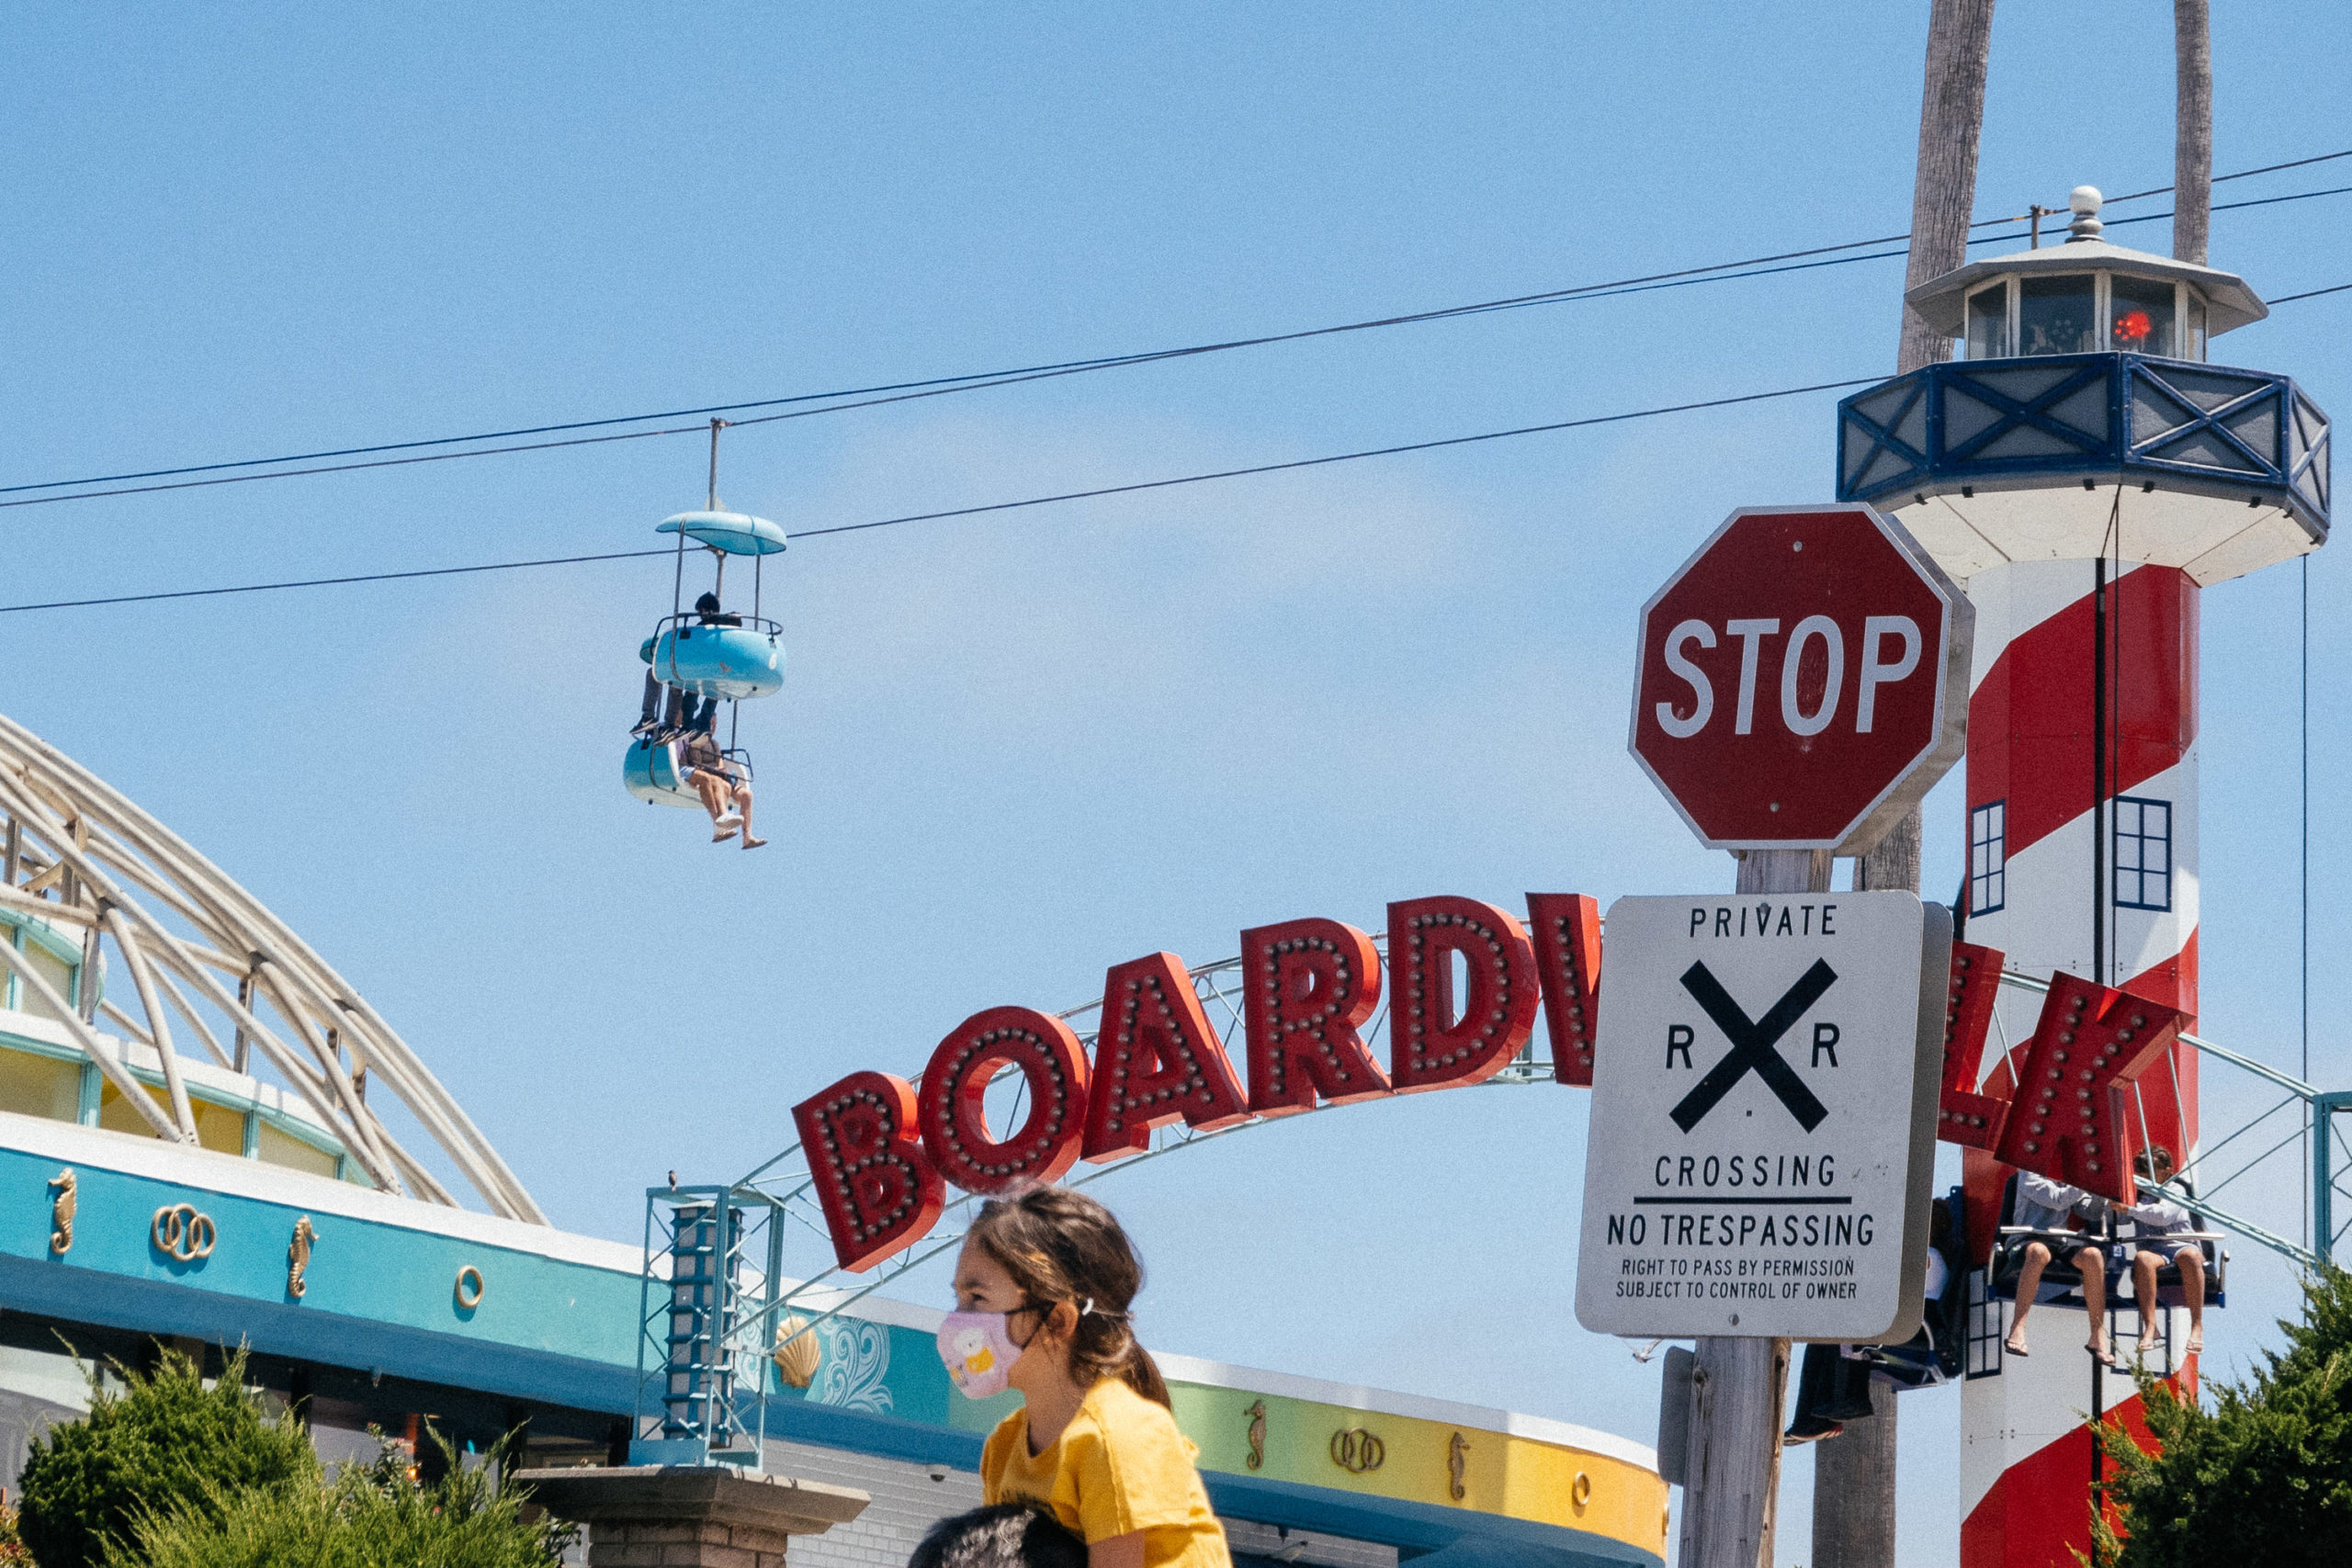 A teal sky lift goes across the sky along a coastal boardwalk amusement park